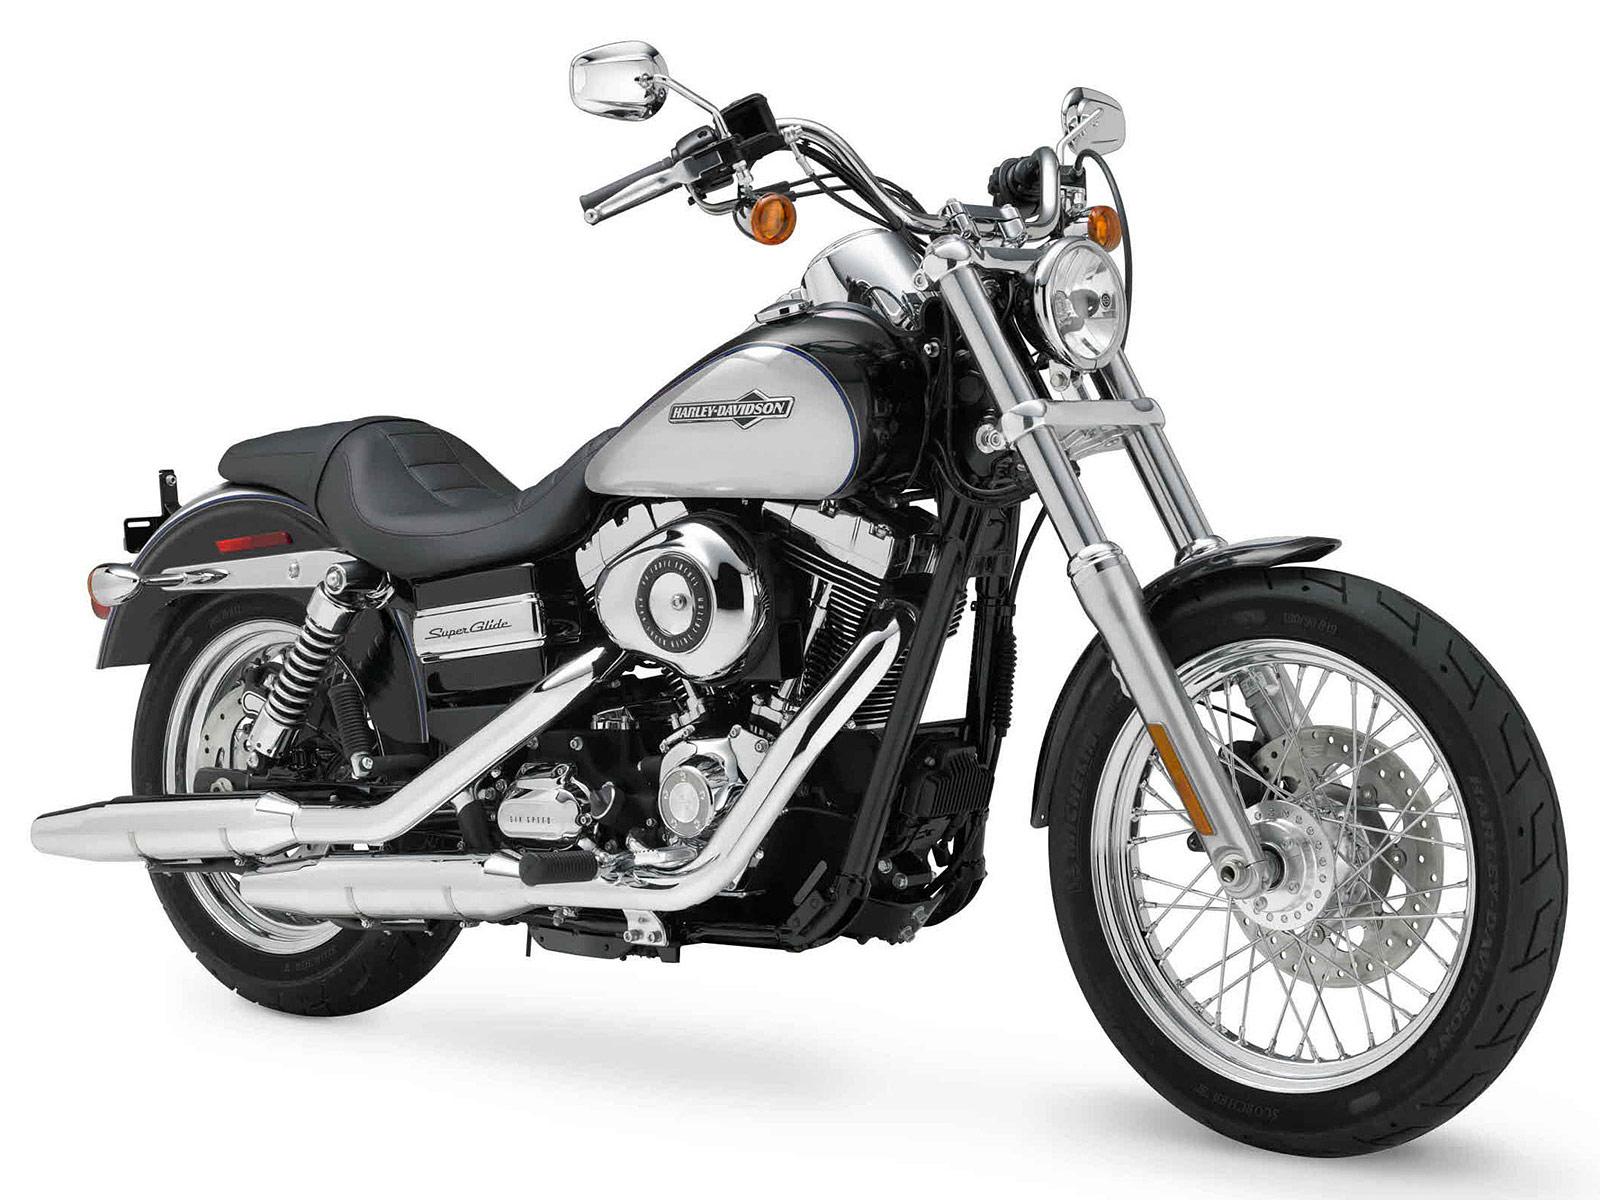 2012 Harley Davidson Fxdc Dyna Super Glide Custom